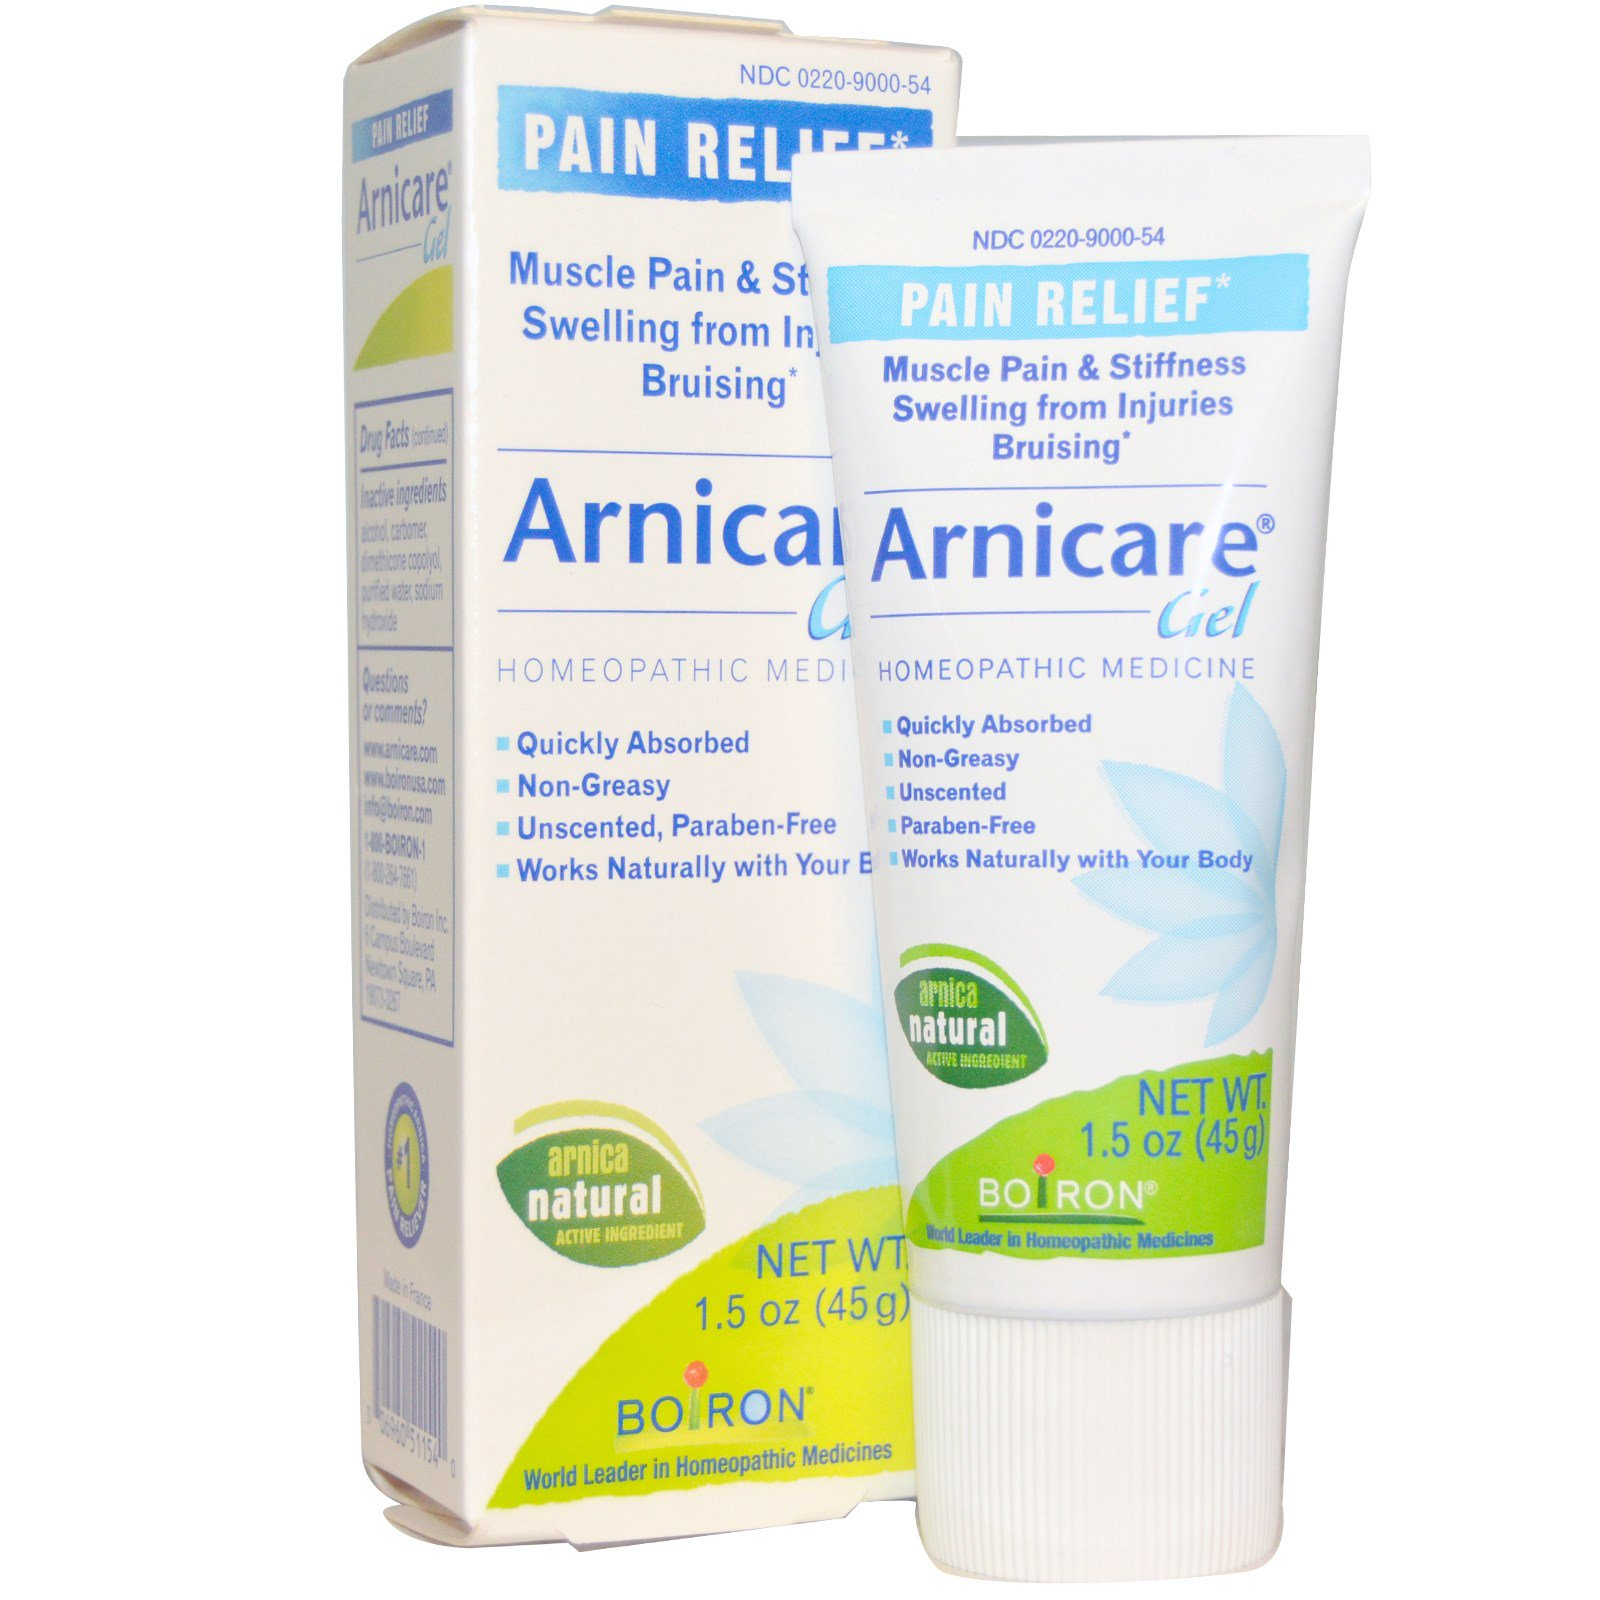 Arnica cream vs boiron gel